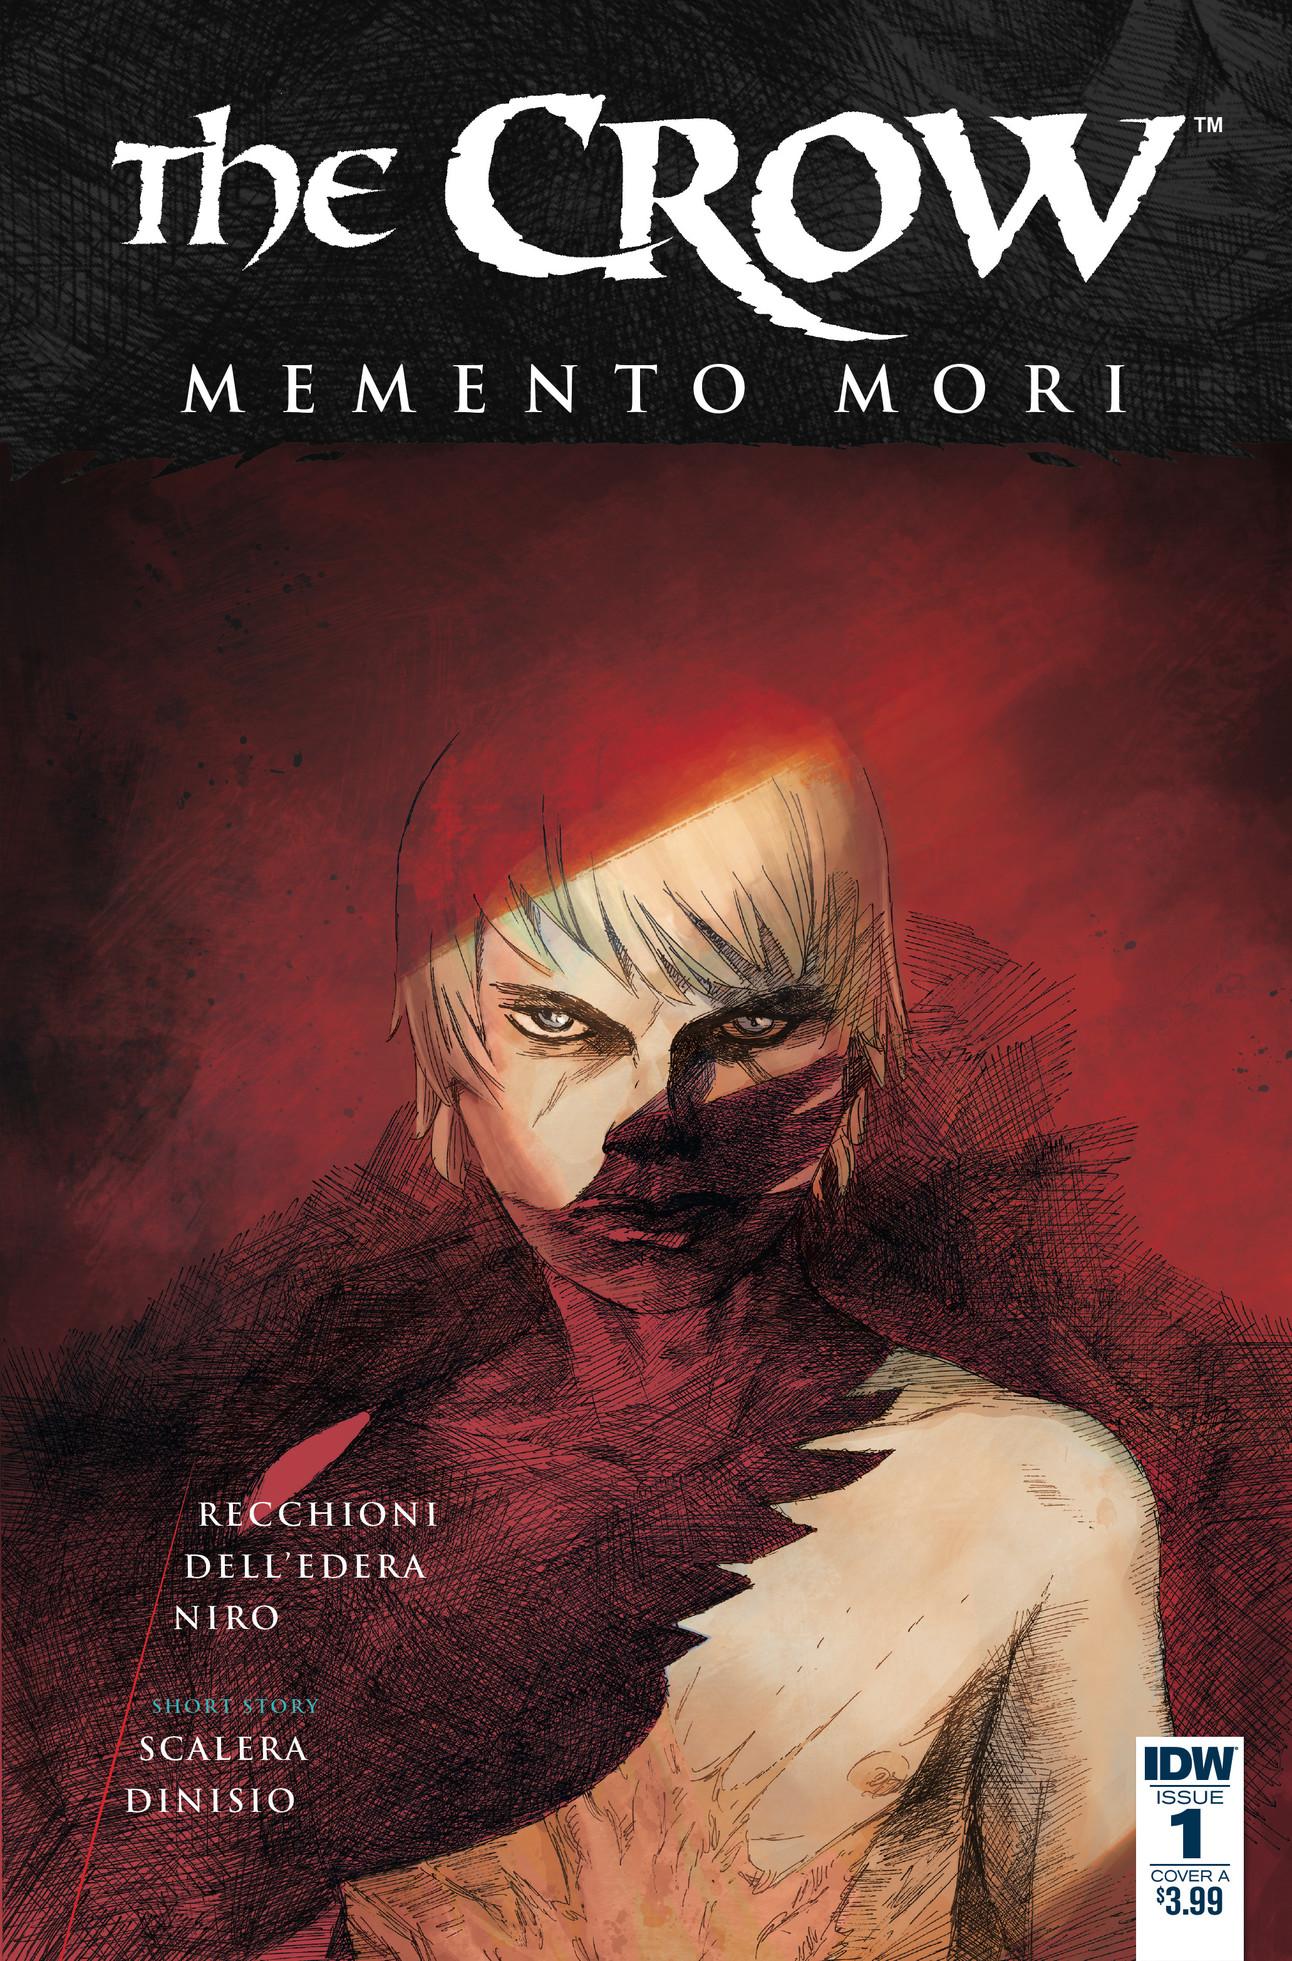 idw_crow_memento_mori_1_cover.jpg